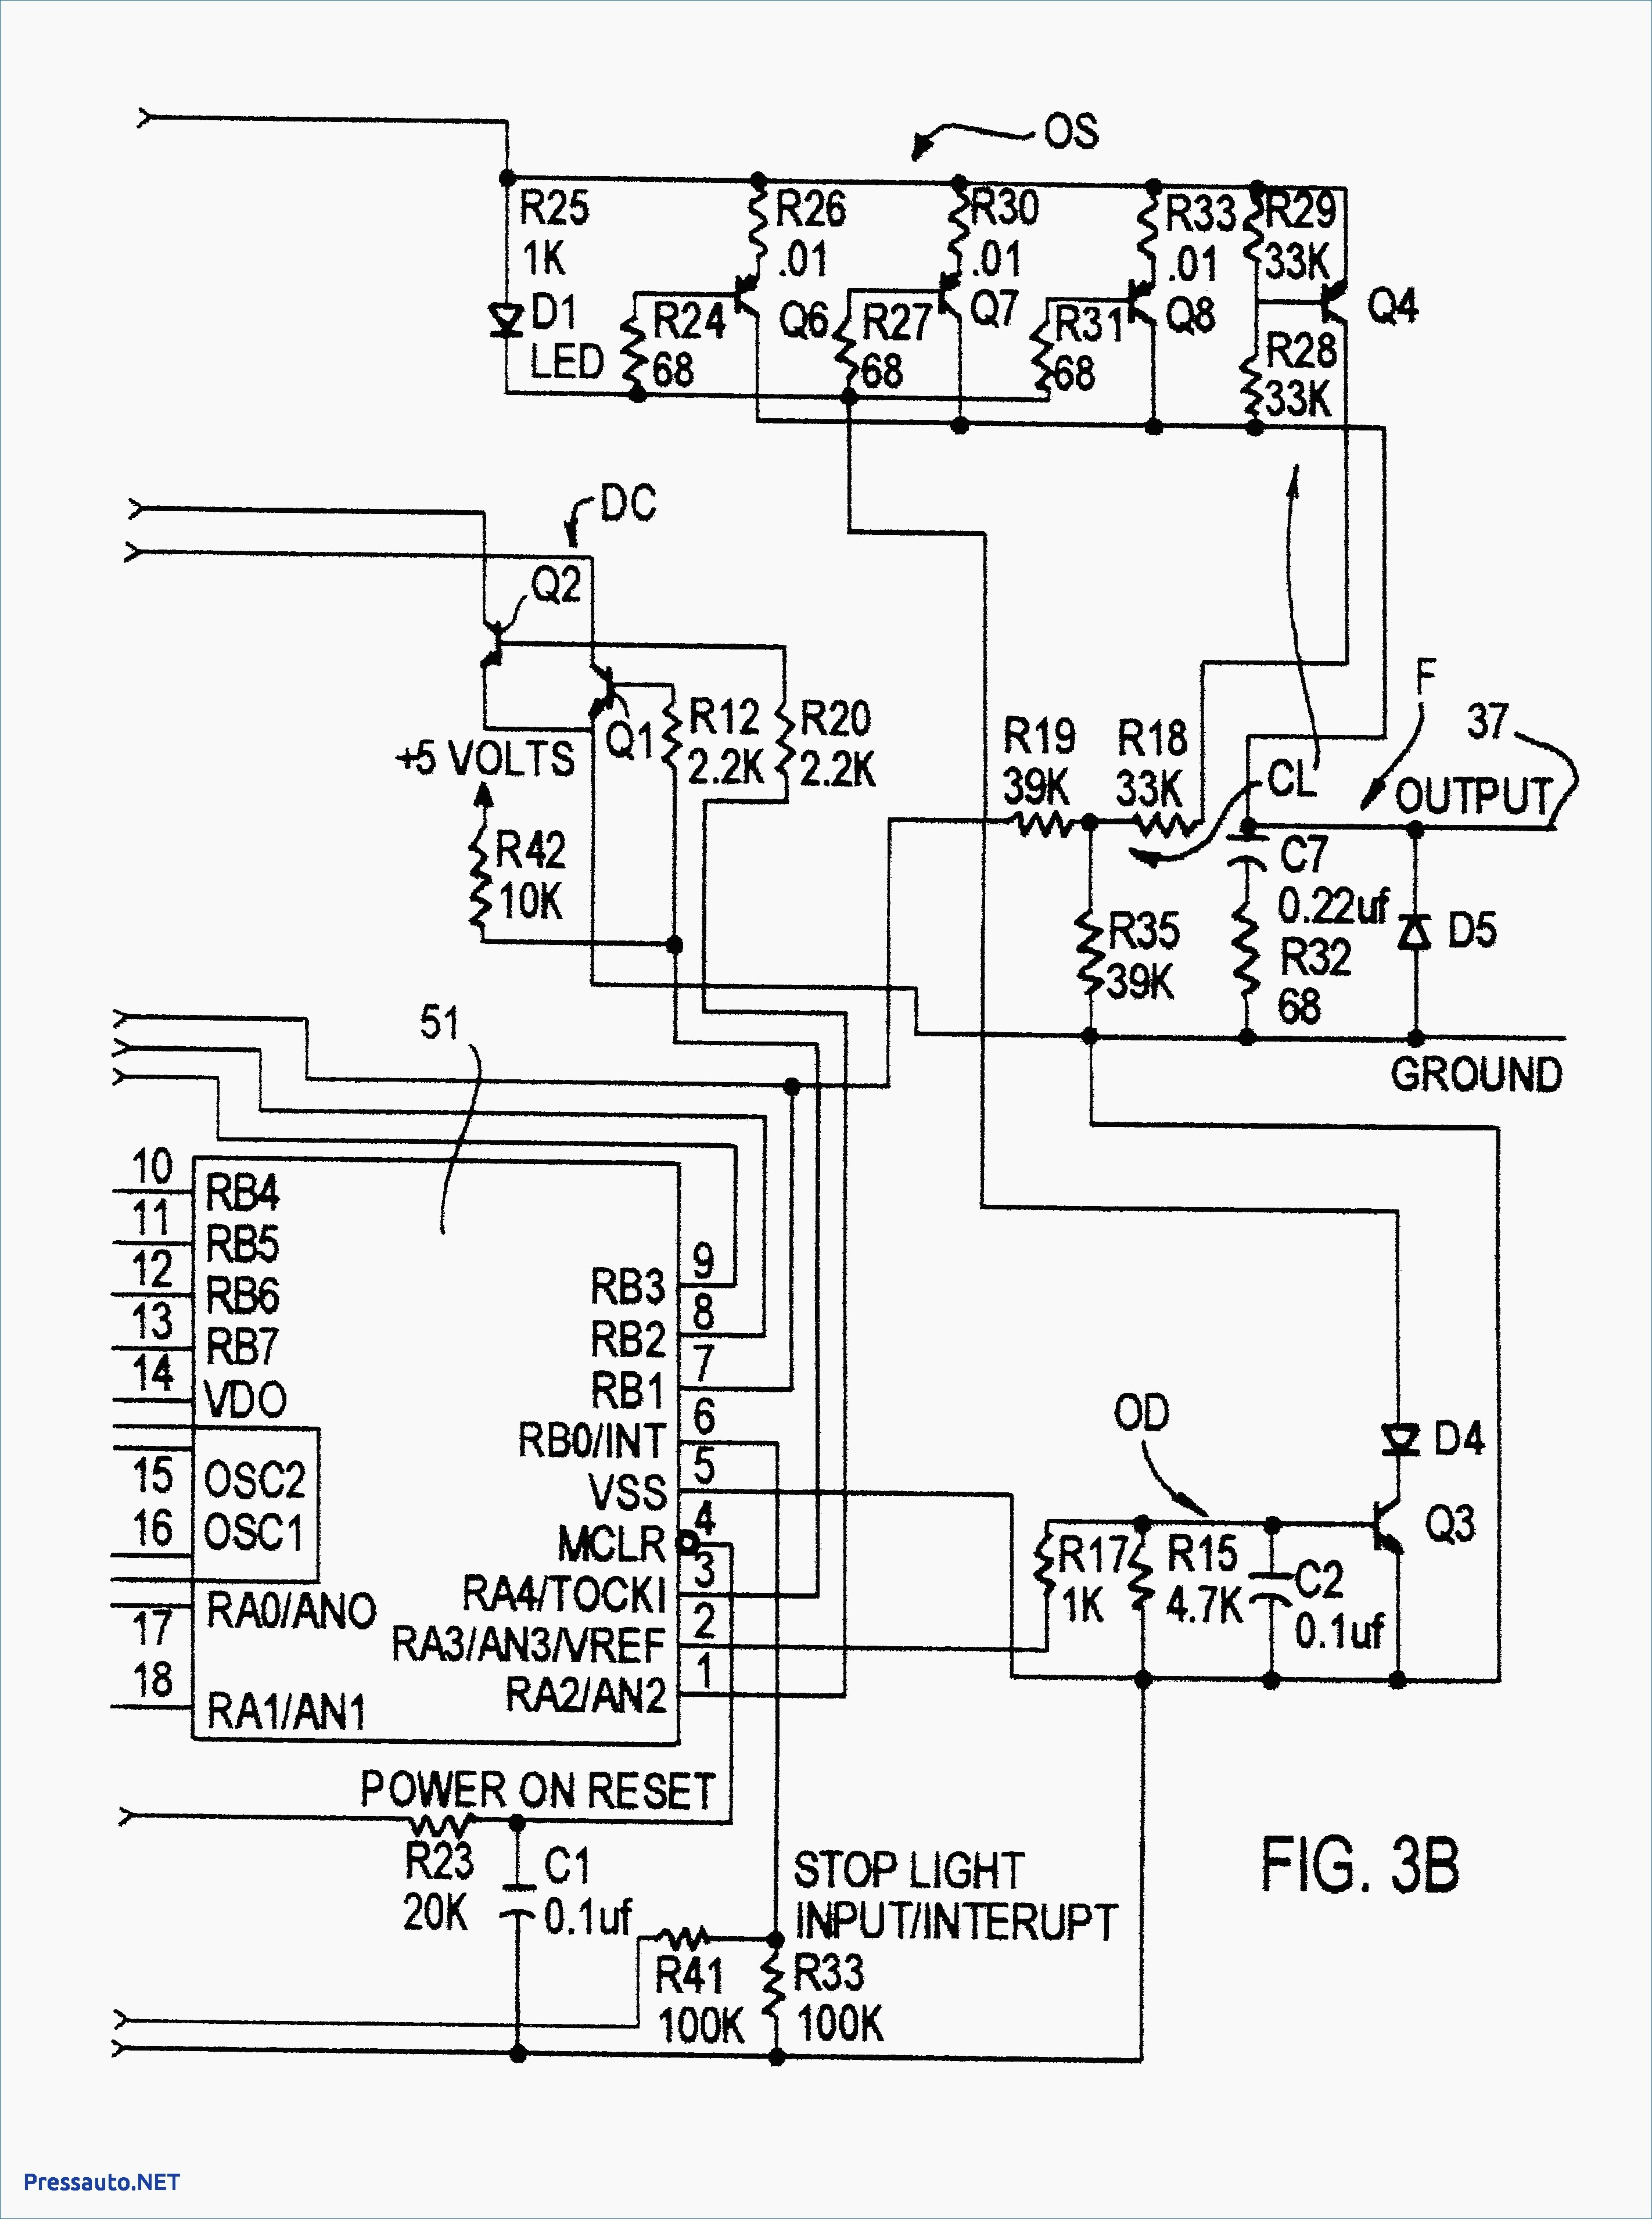 Trailer Breakaway Kit Wiring Diagram Trailer Brake Controller Wiring Diagram Trailer Brake Control